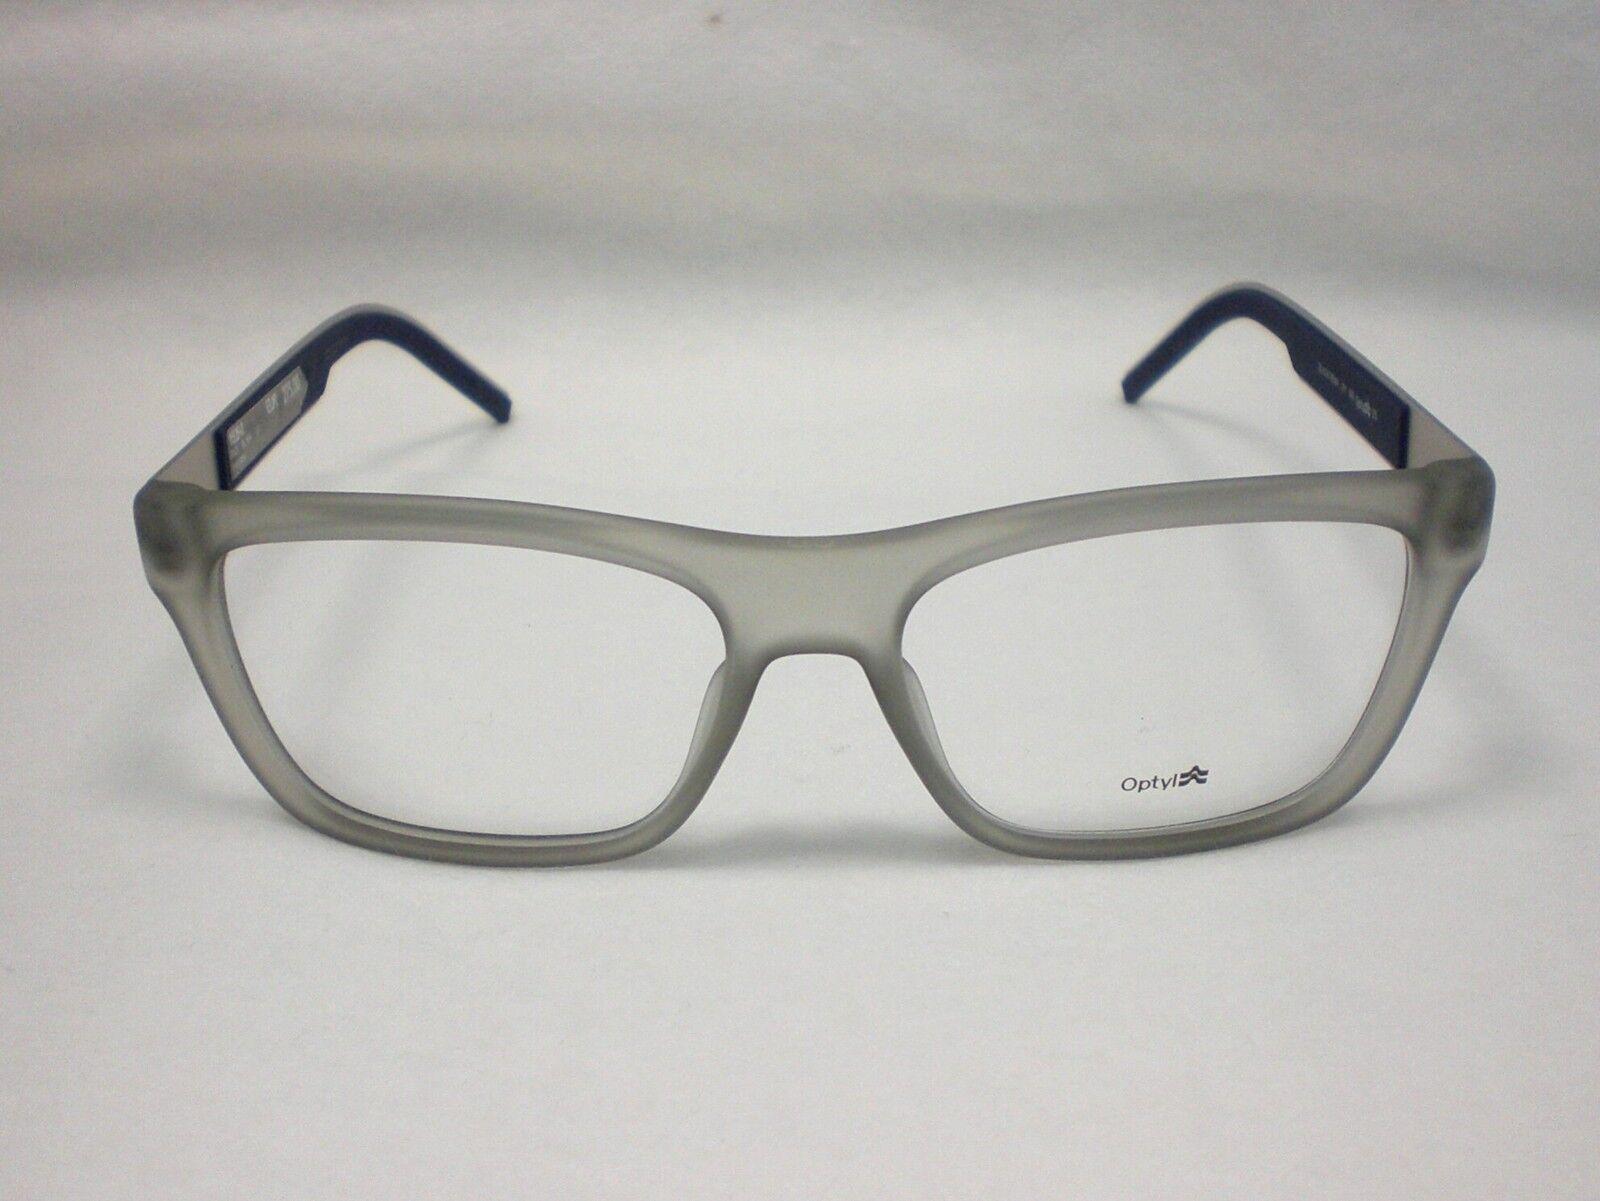 Occhiali da Vista Prodesign 1501 5035 wOrfcz